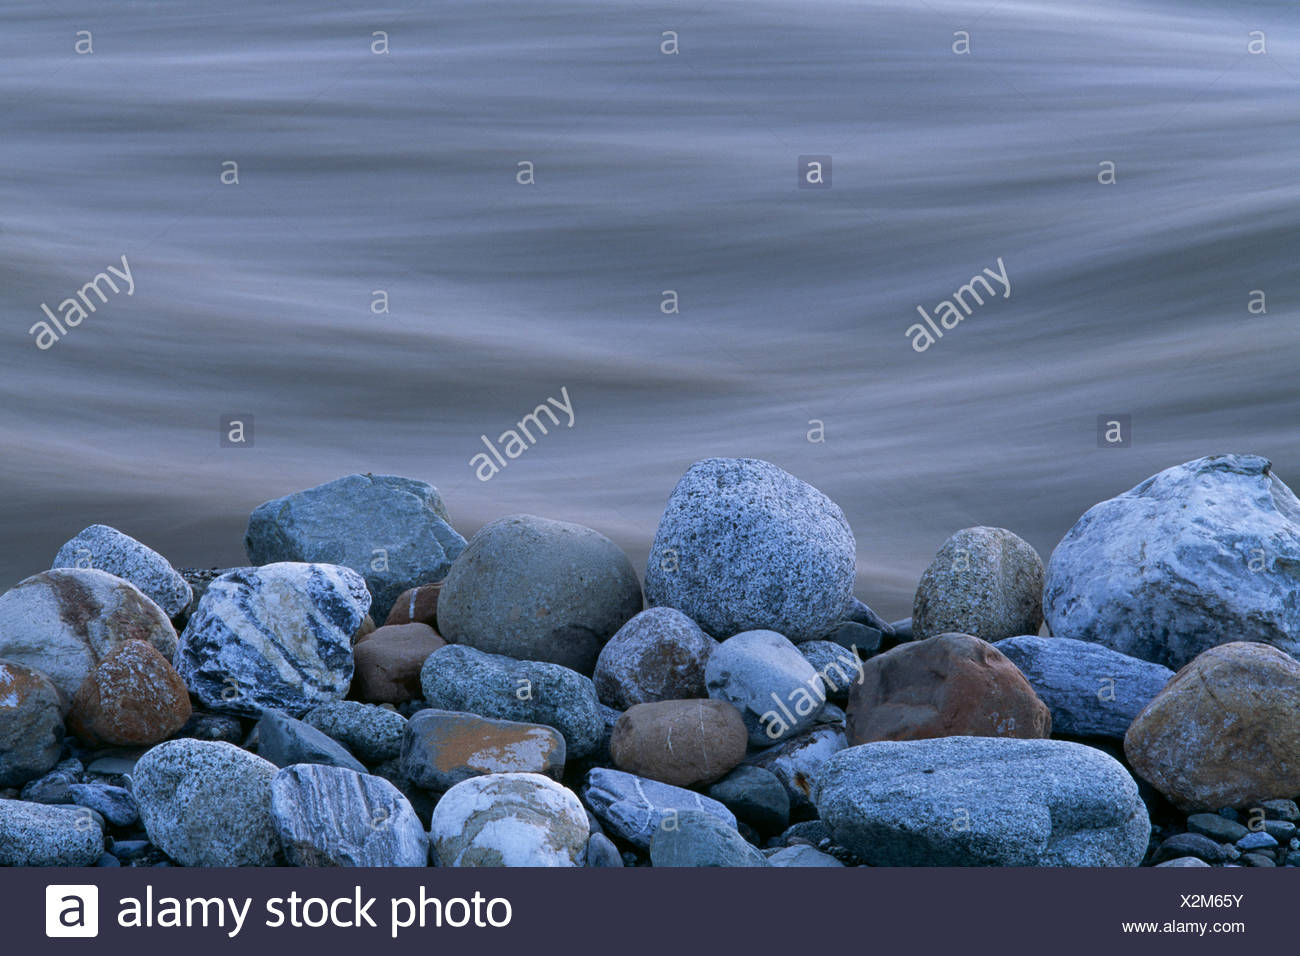 A close-up of the rocks on the shore of the Tashenshini River, Yukon, Canada - Stock Image